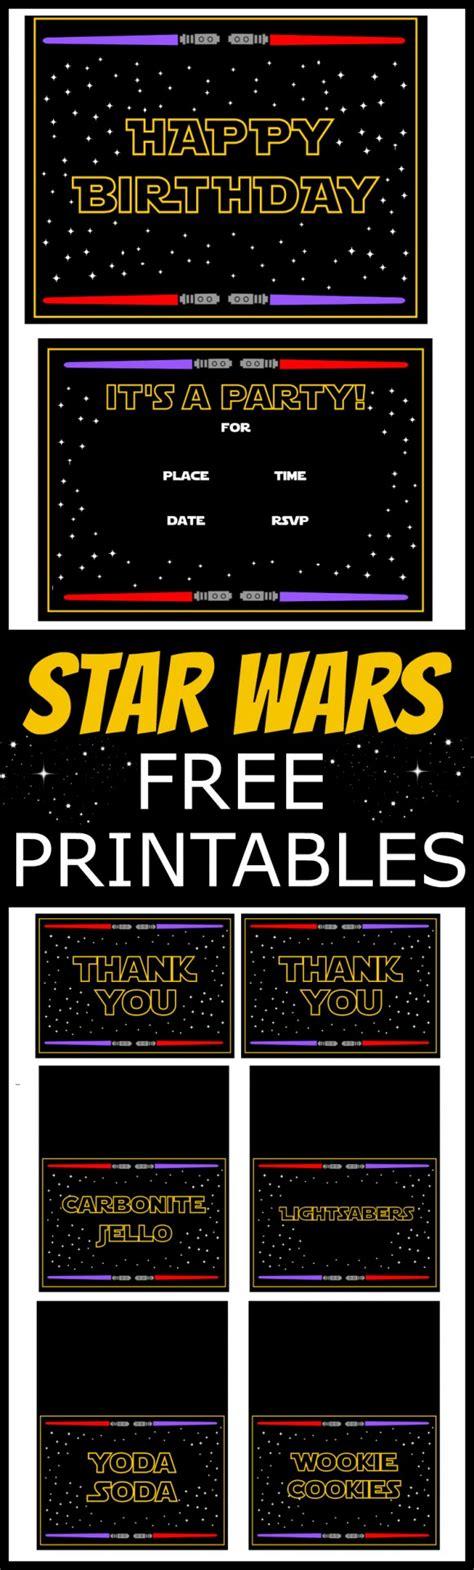 printable star wars star wars banner tutorial star wars birthday pinterest